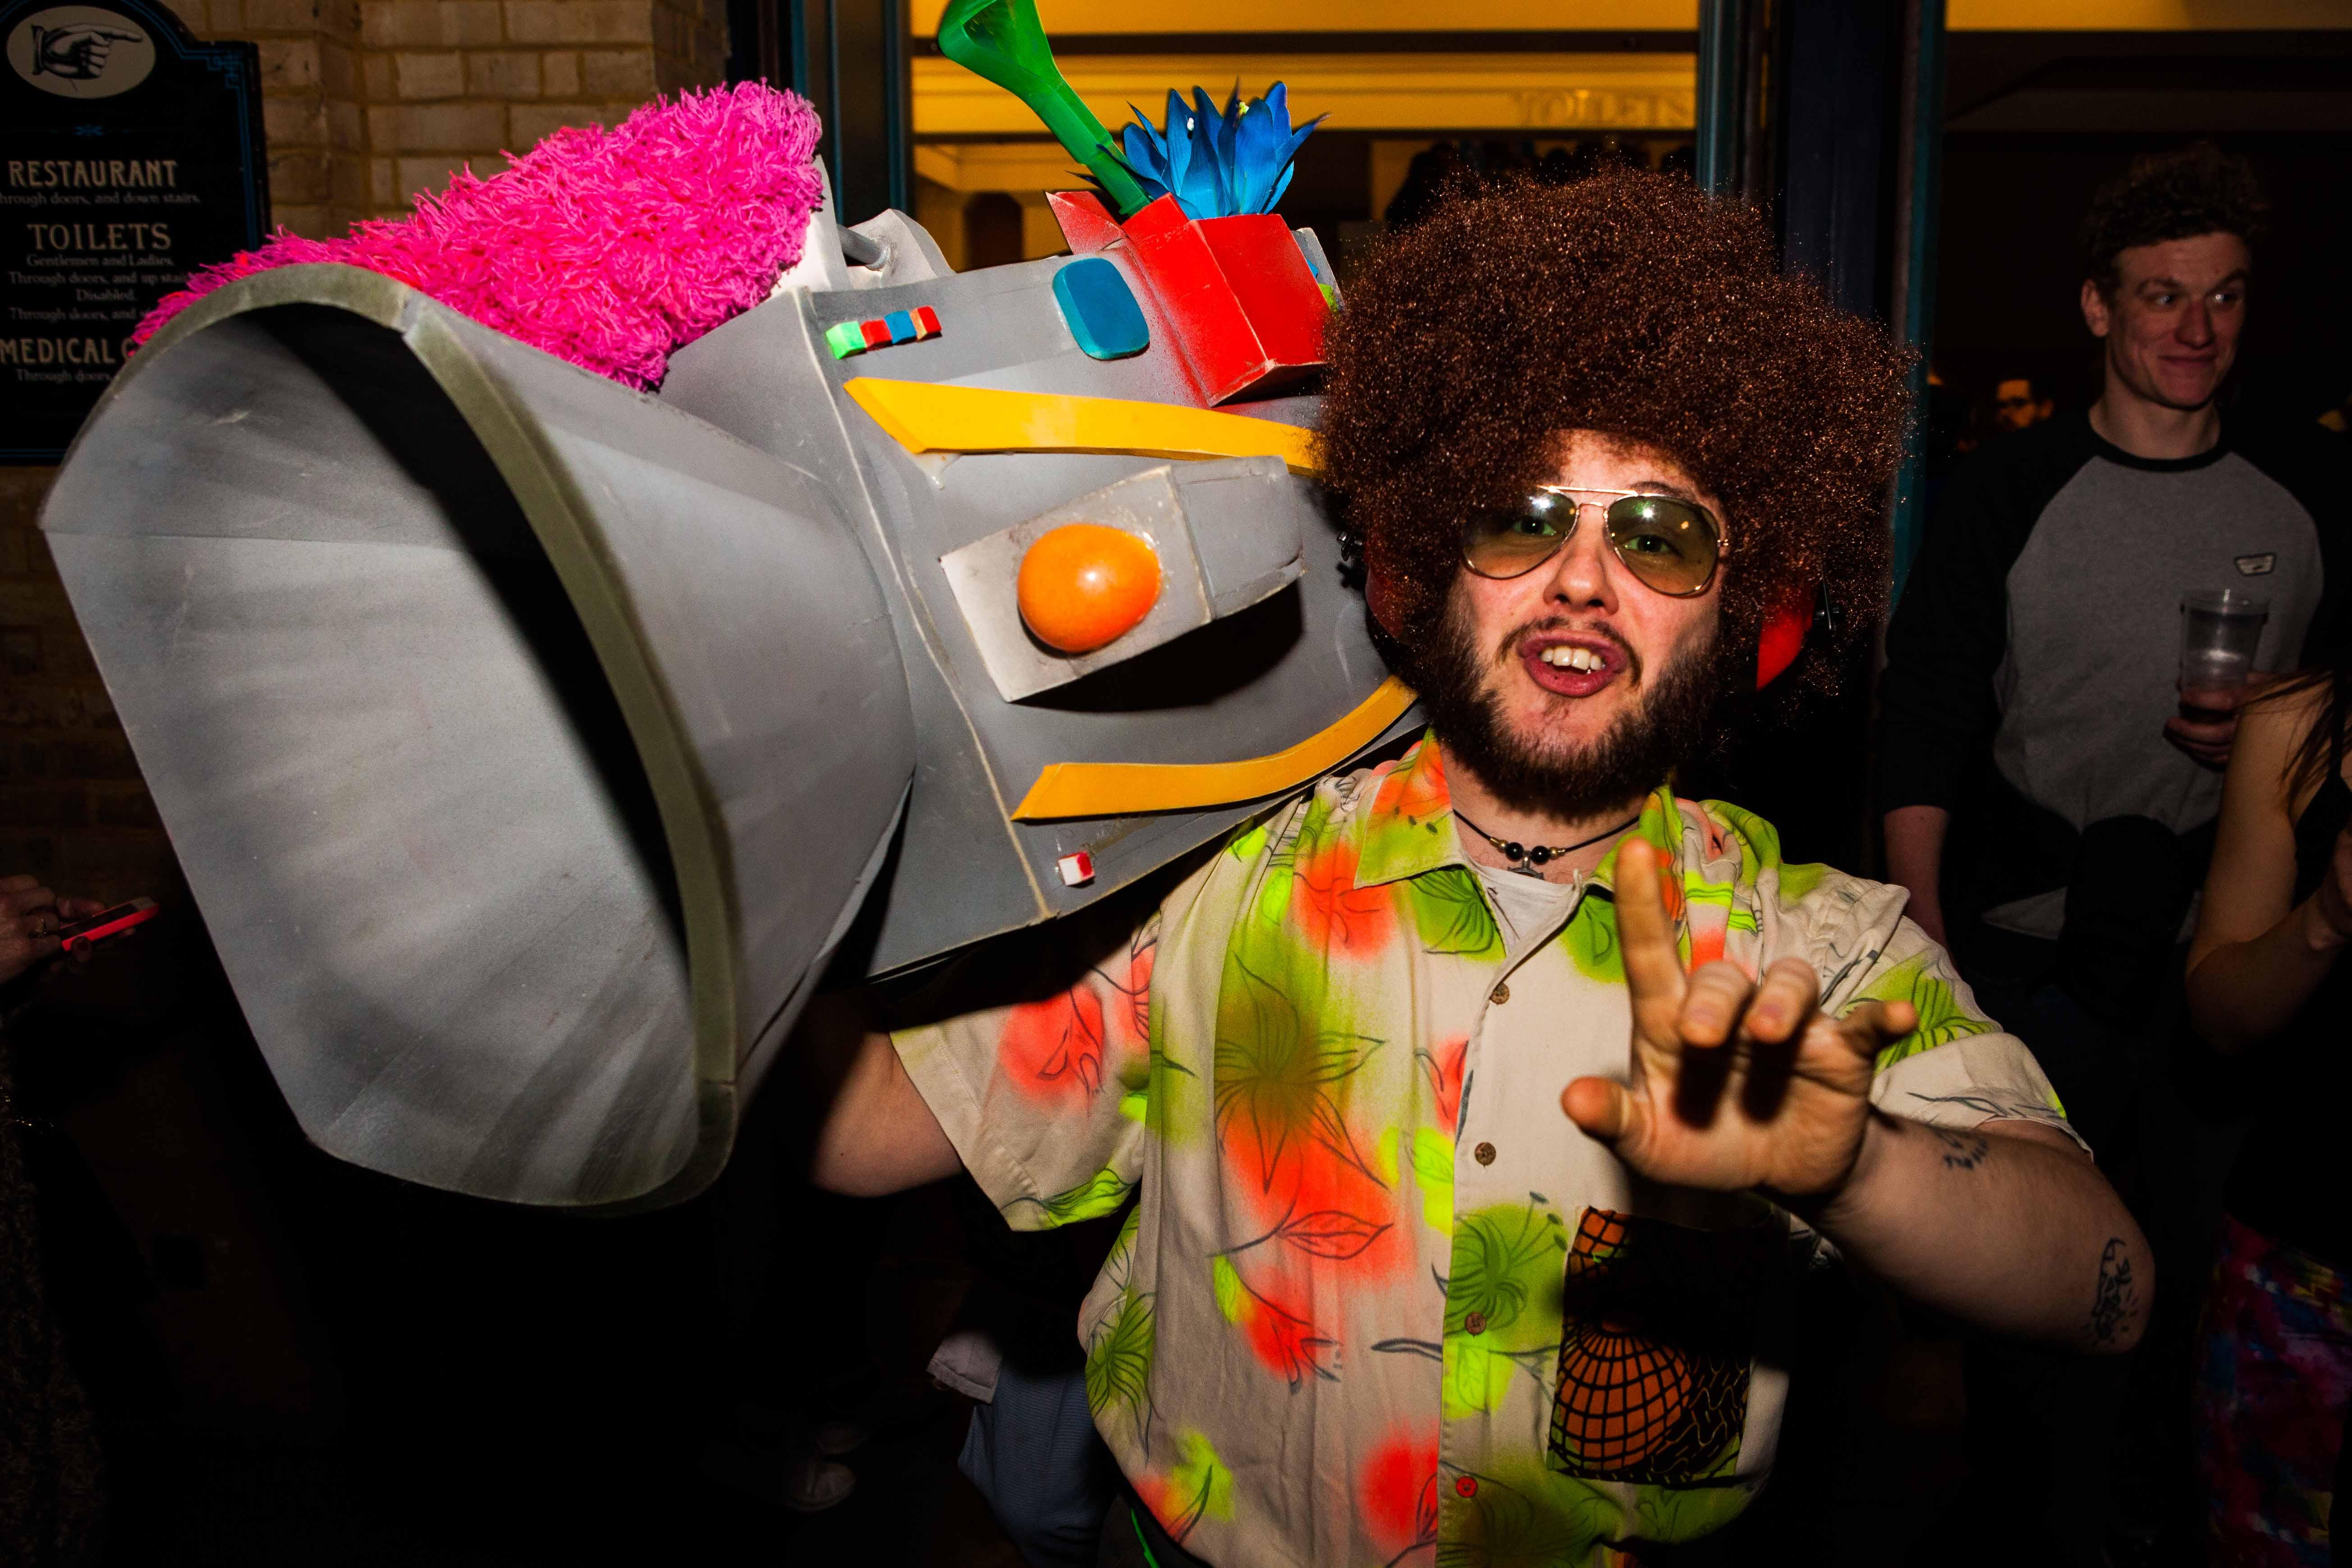 Fatboy Slim, Ally Pally and The Acid Converter. | Nicholas Ball